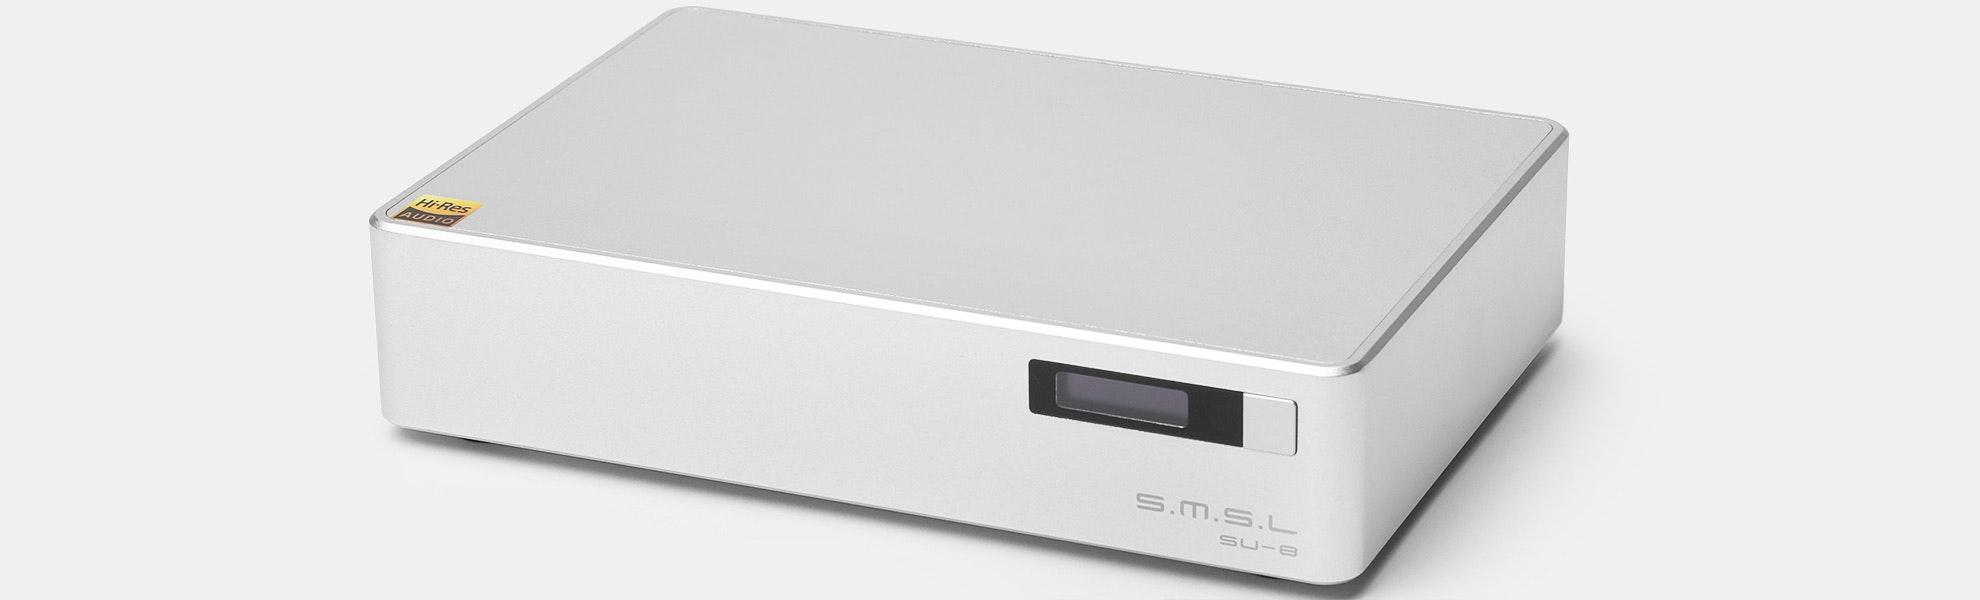 SMSL SU-8 DAC & SH-8 Headphone Amp